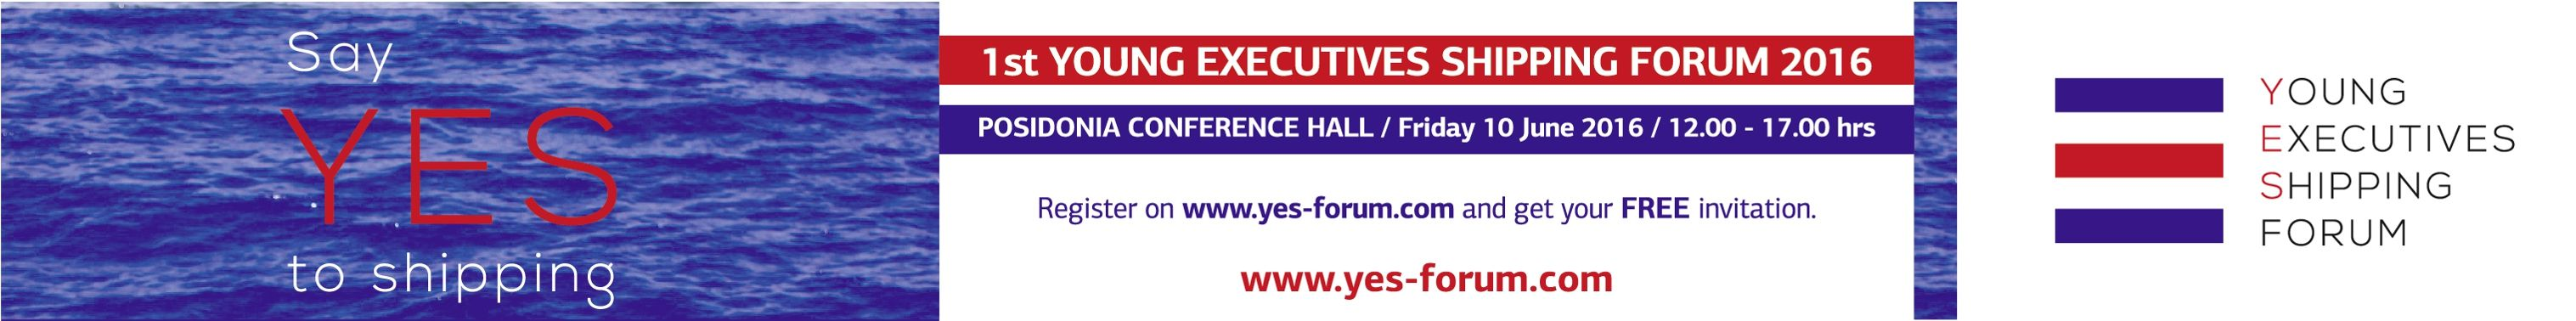 1st Young Executives Shipping Forum at Posidonia - Say YES to Shipping